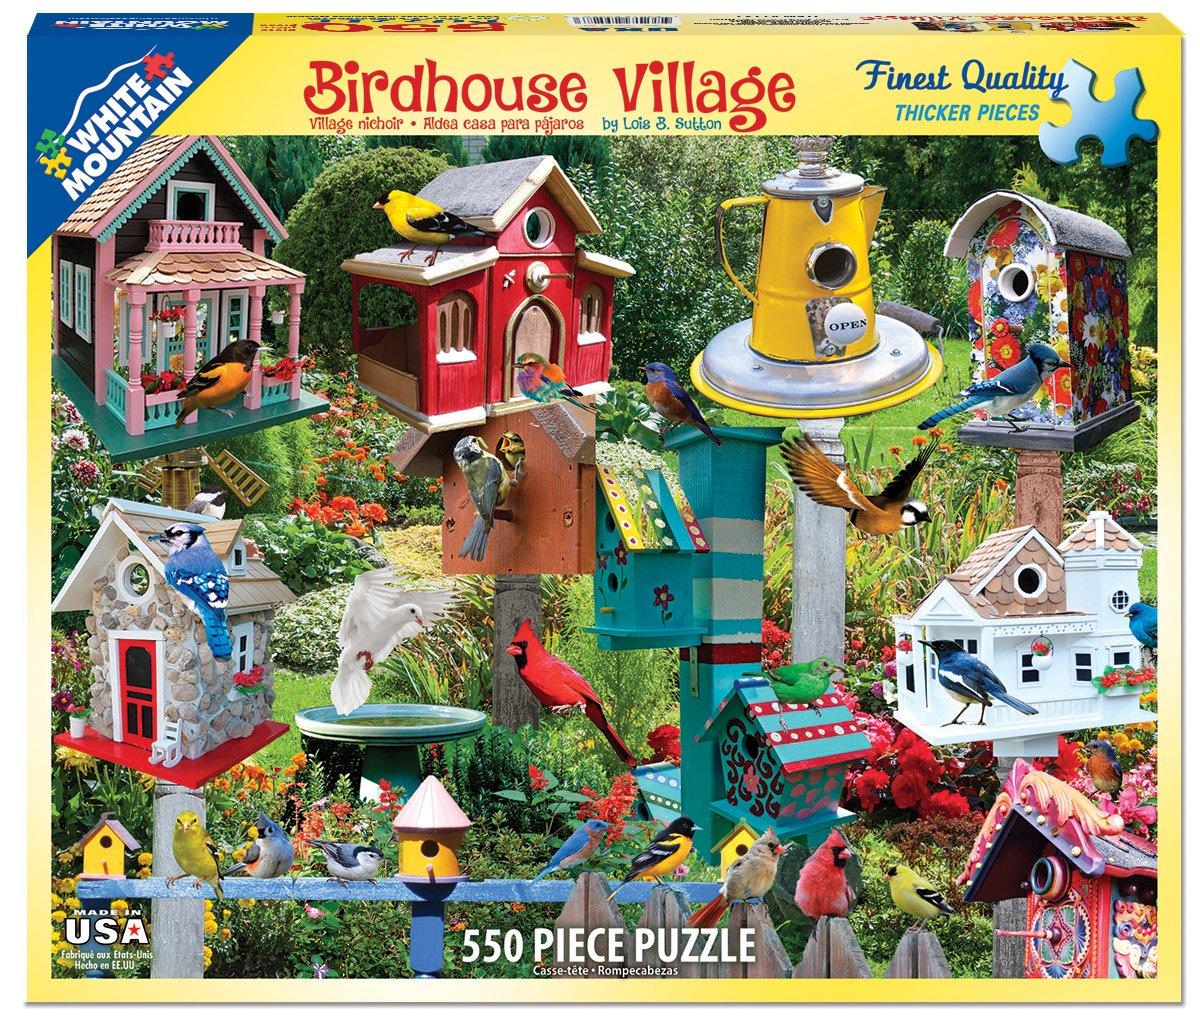 550 Piece Jigsaw Puzzle Inc 1137 White Mountain Puzzles Birdhouse Village